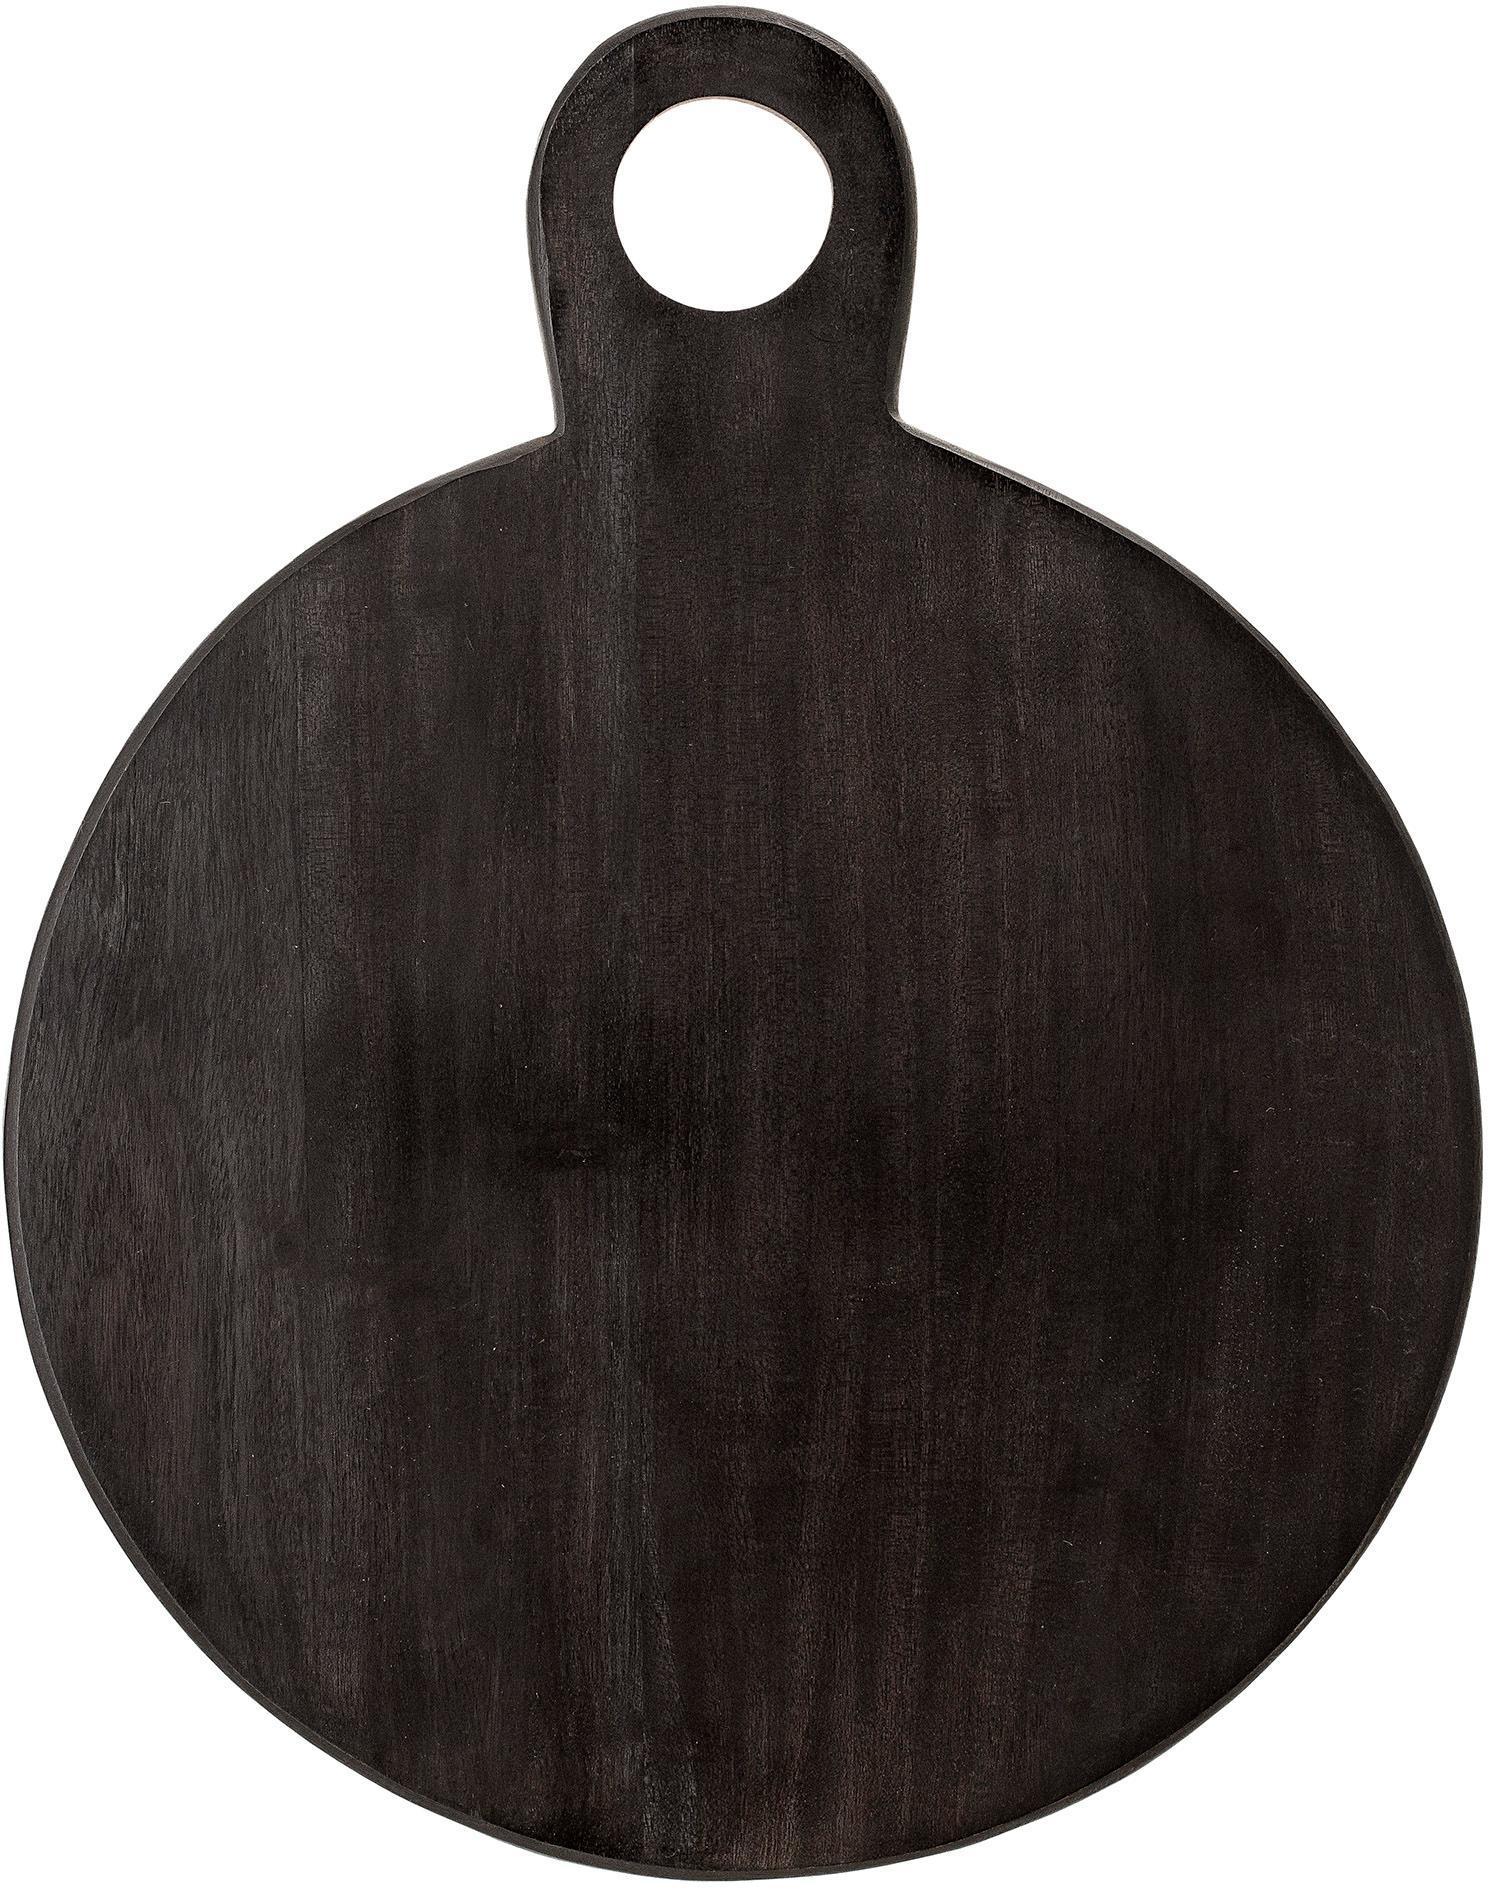 Tabla de cortar Hola, Madera de acacia, recubierto, Negro, An 36 x F 46 cm